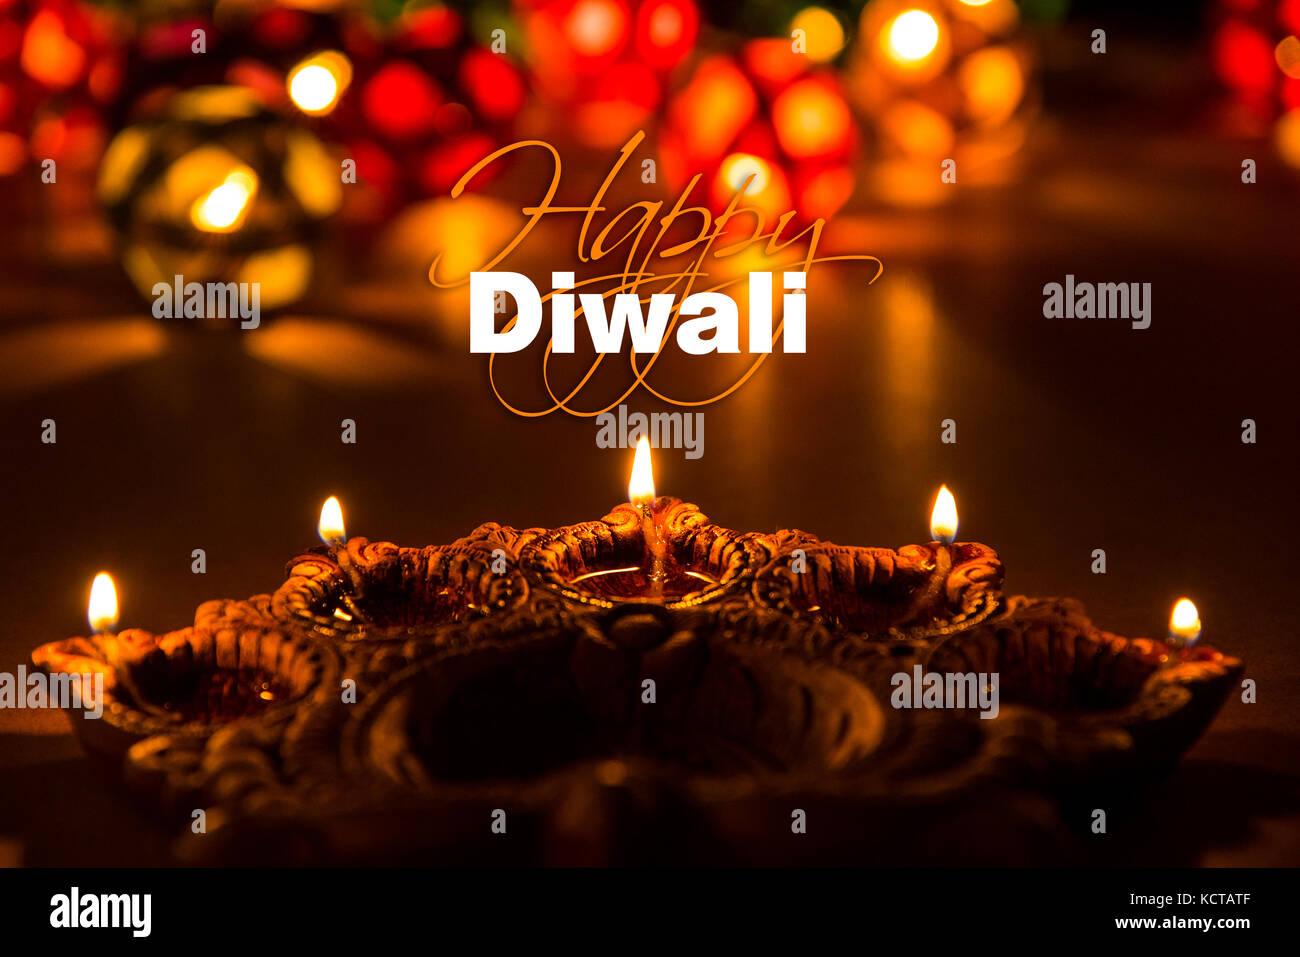 Stock Photo Of Diwali Greeting Card Showing Illuminated Diya Or Oil